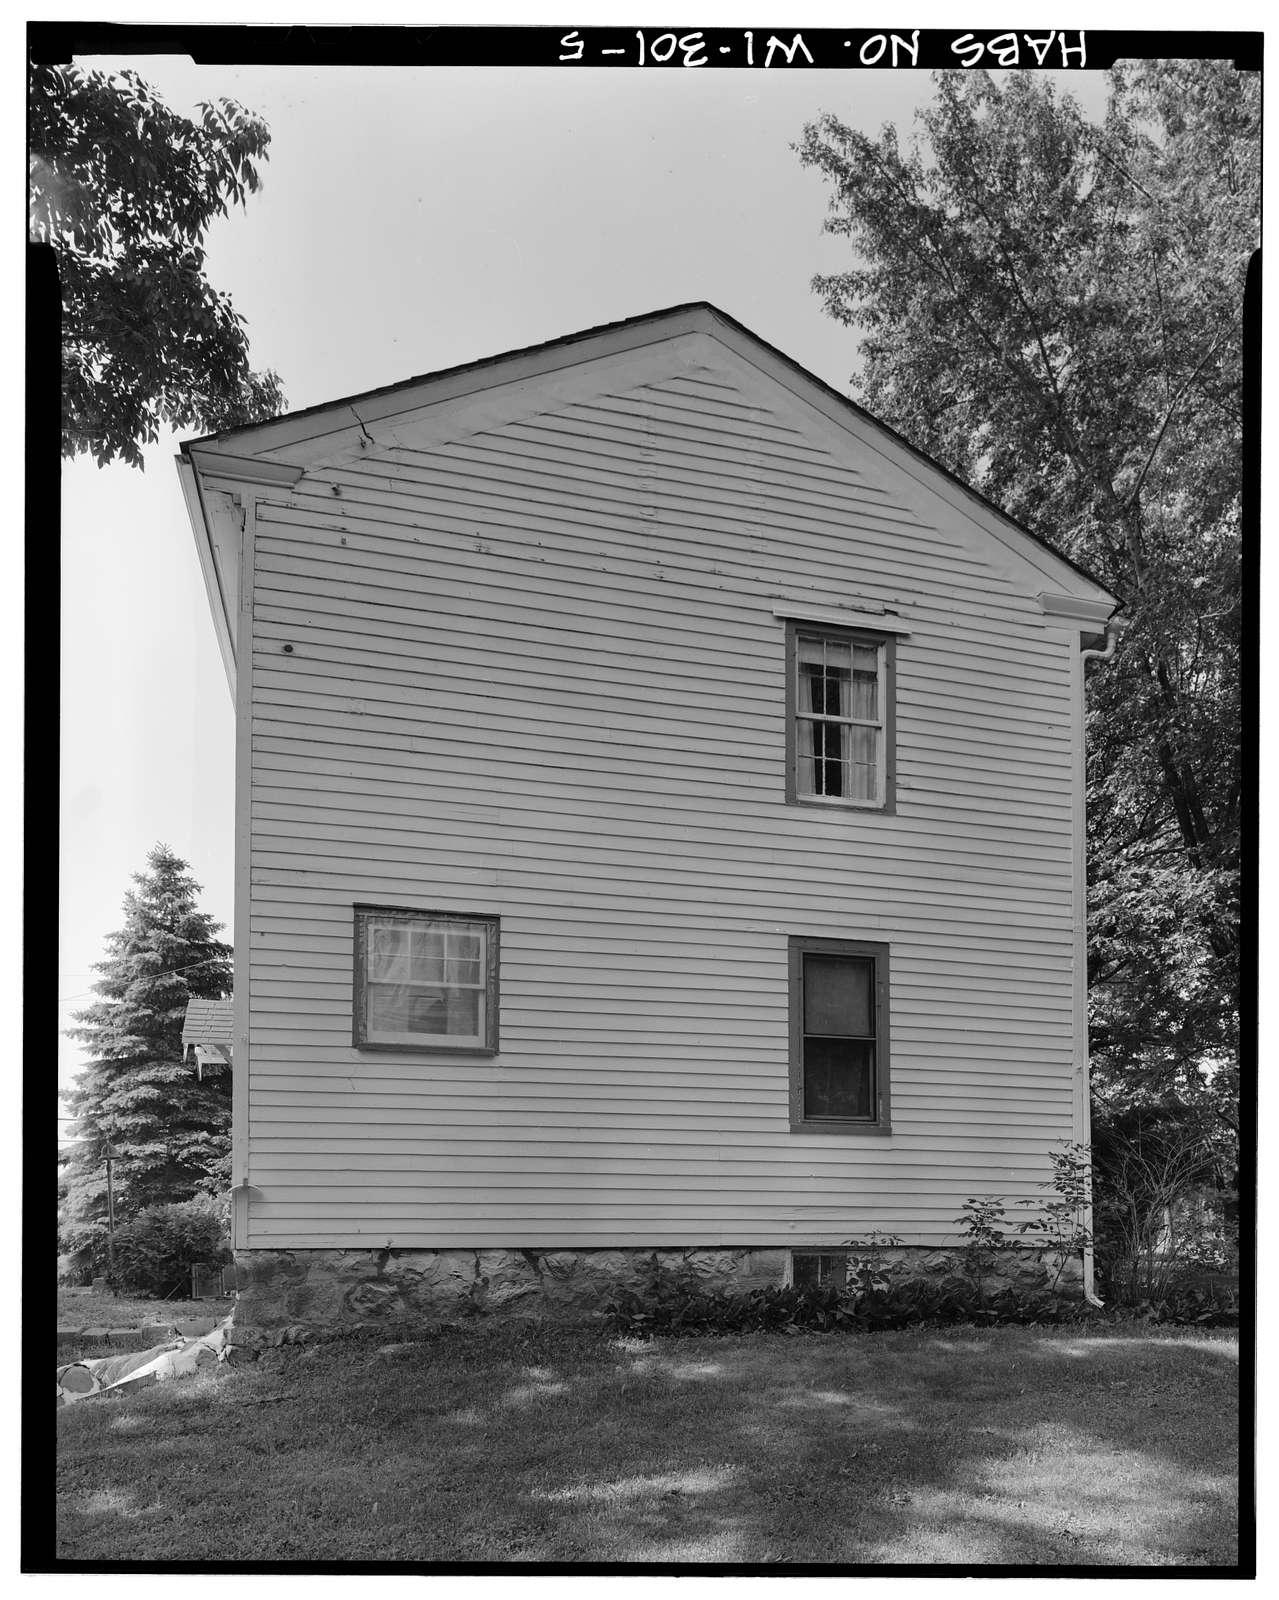 A. B. Jackson House, State Trunk Highway 50, Bristol, Kenosha County, WI